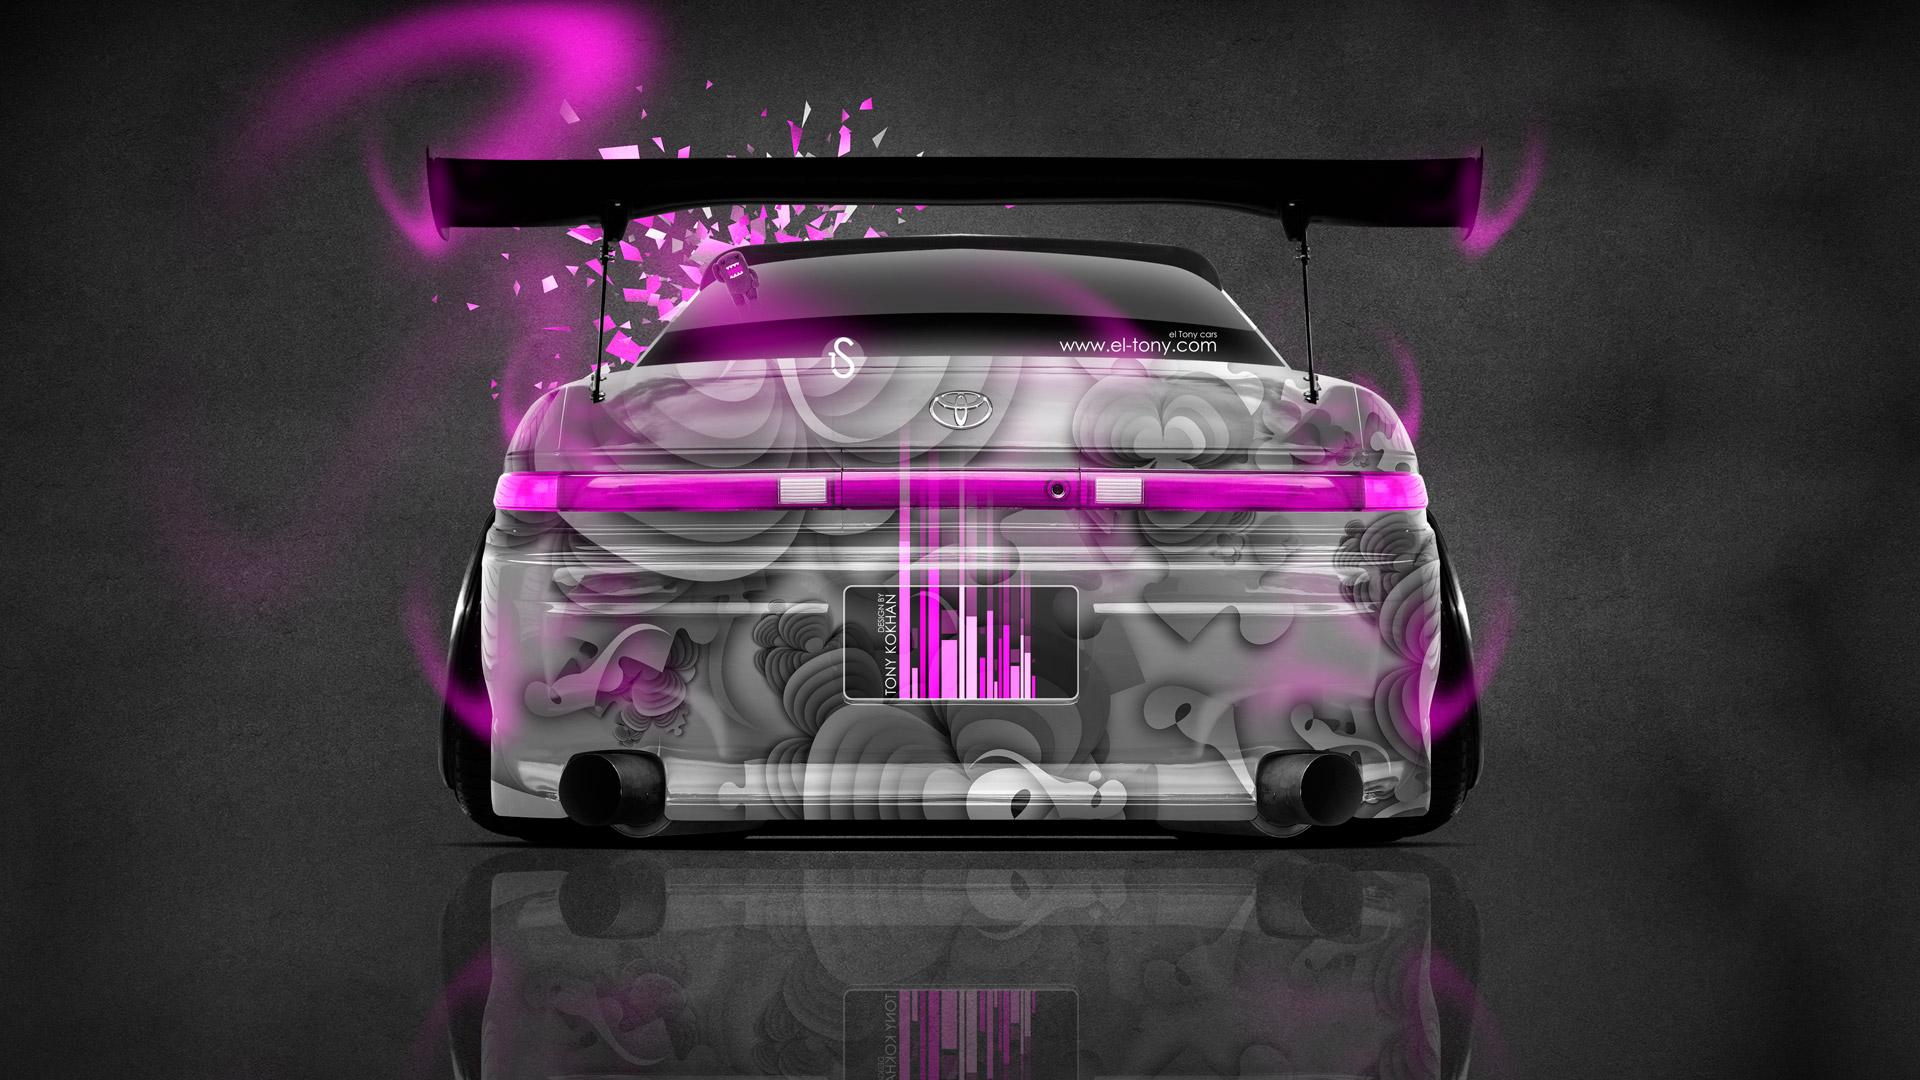 Jdm Toyota Chaser Jzx100. Pink And Black Batman Car 18 Desktop Background